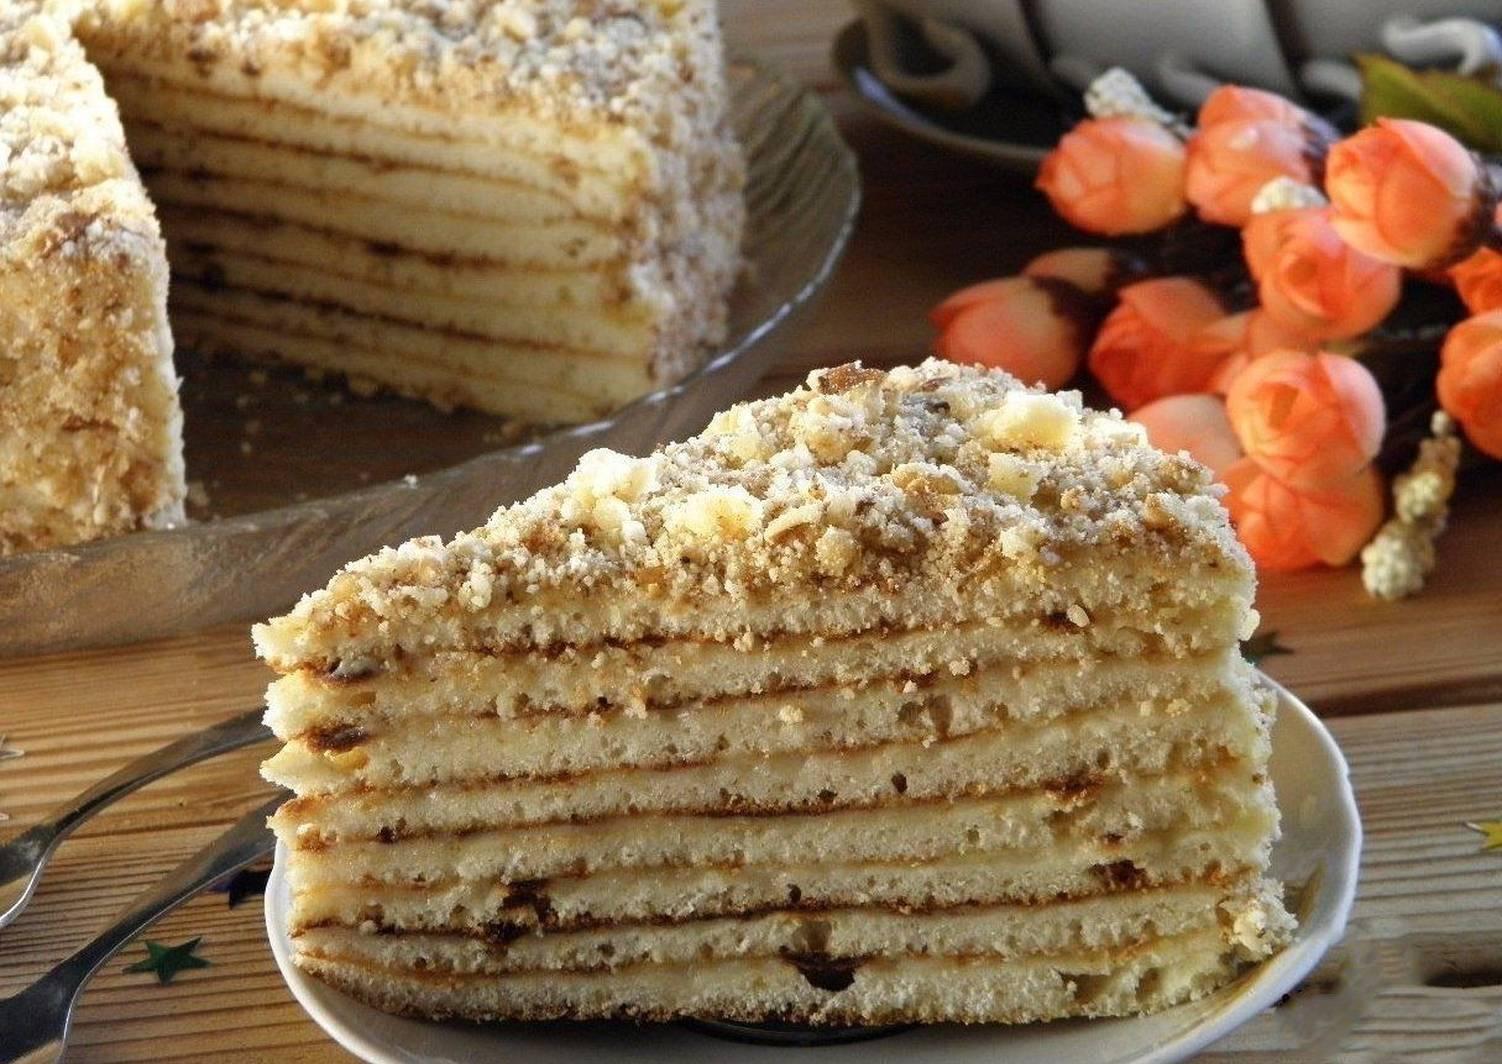 рецепты тортов с фото поваренок ру новинки декоративной